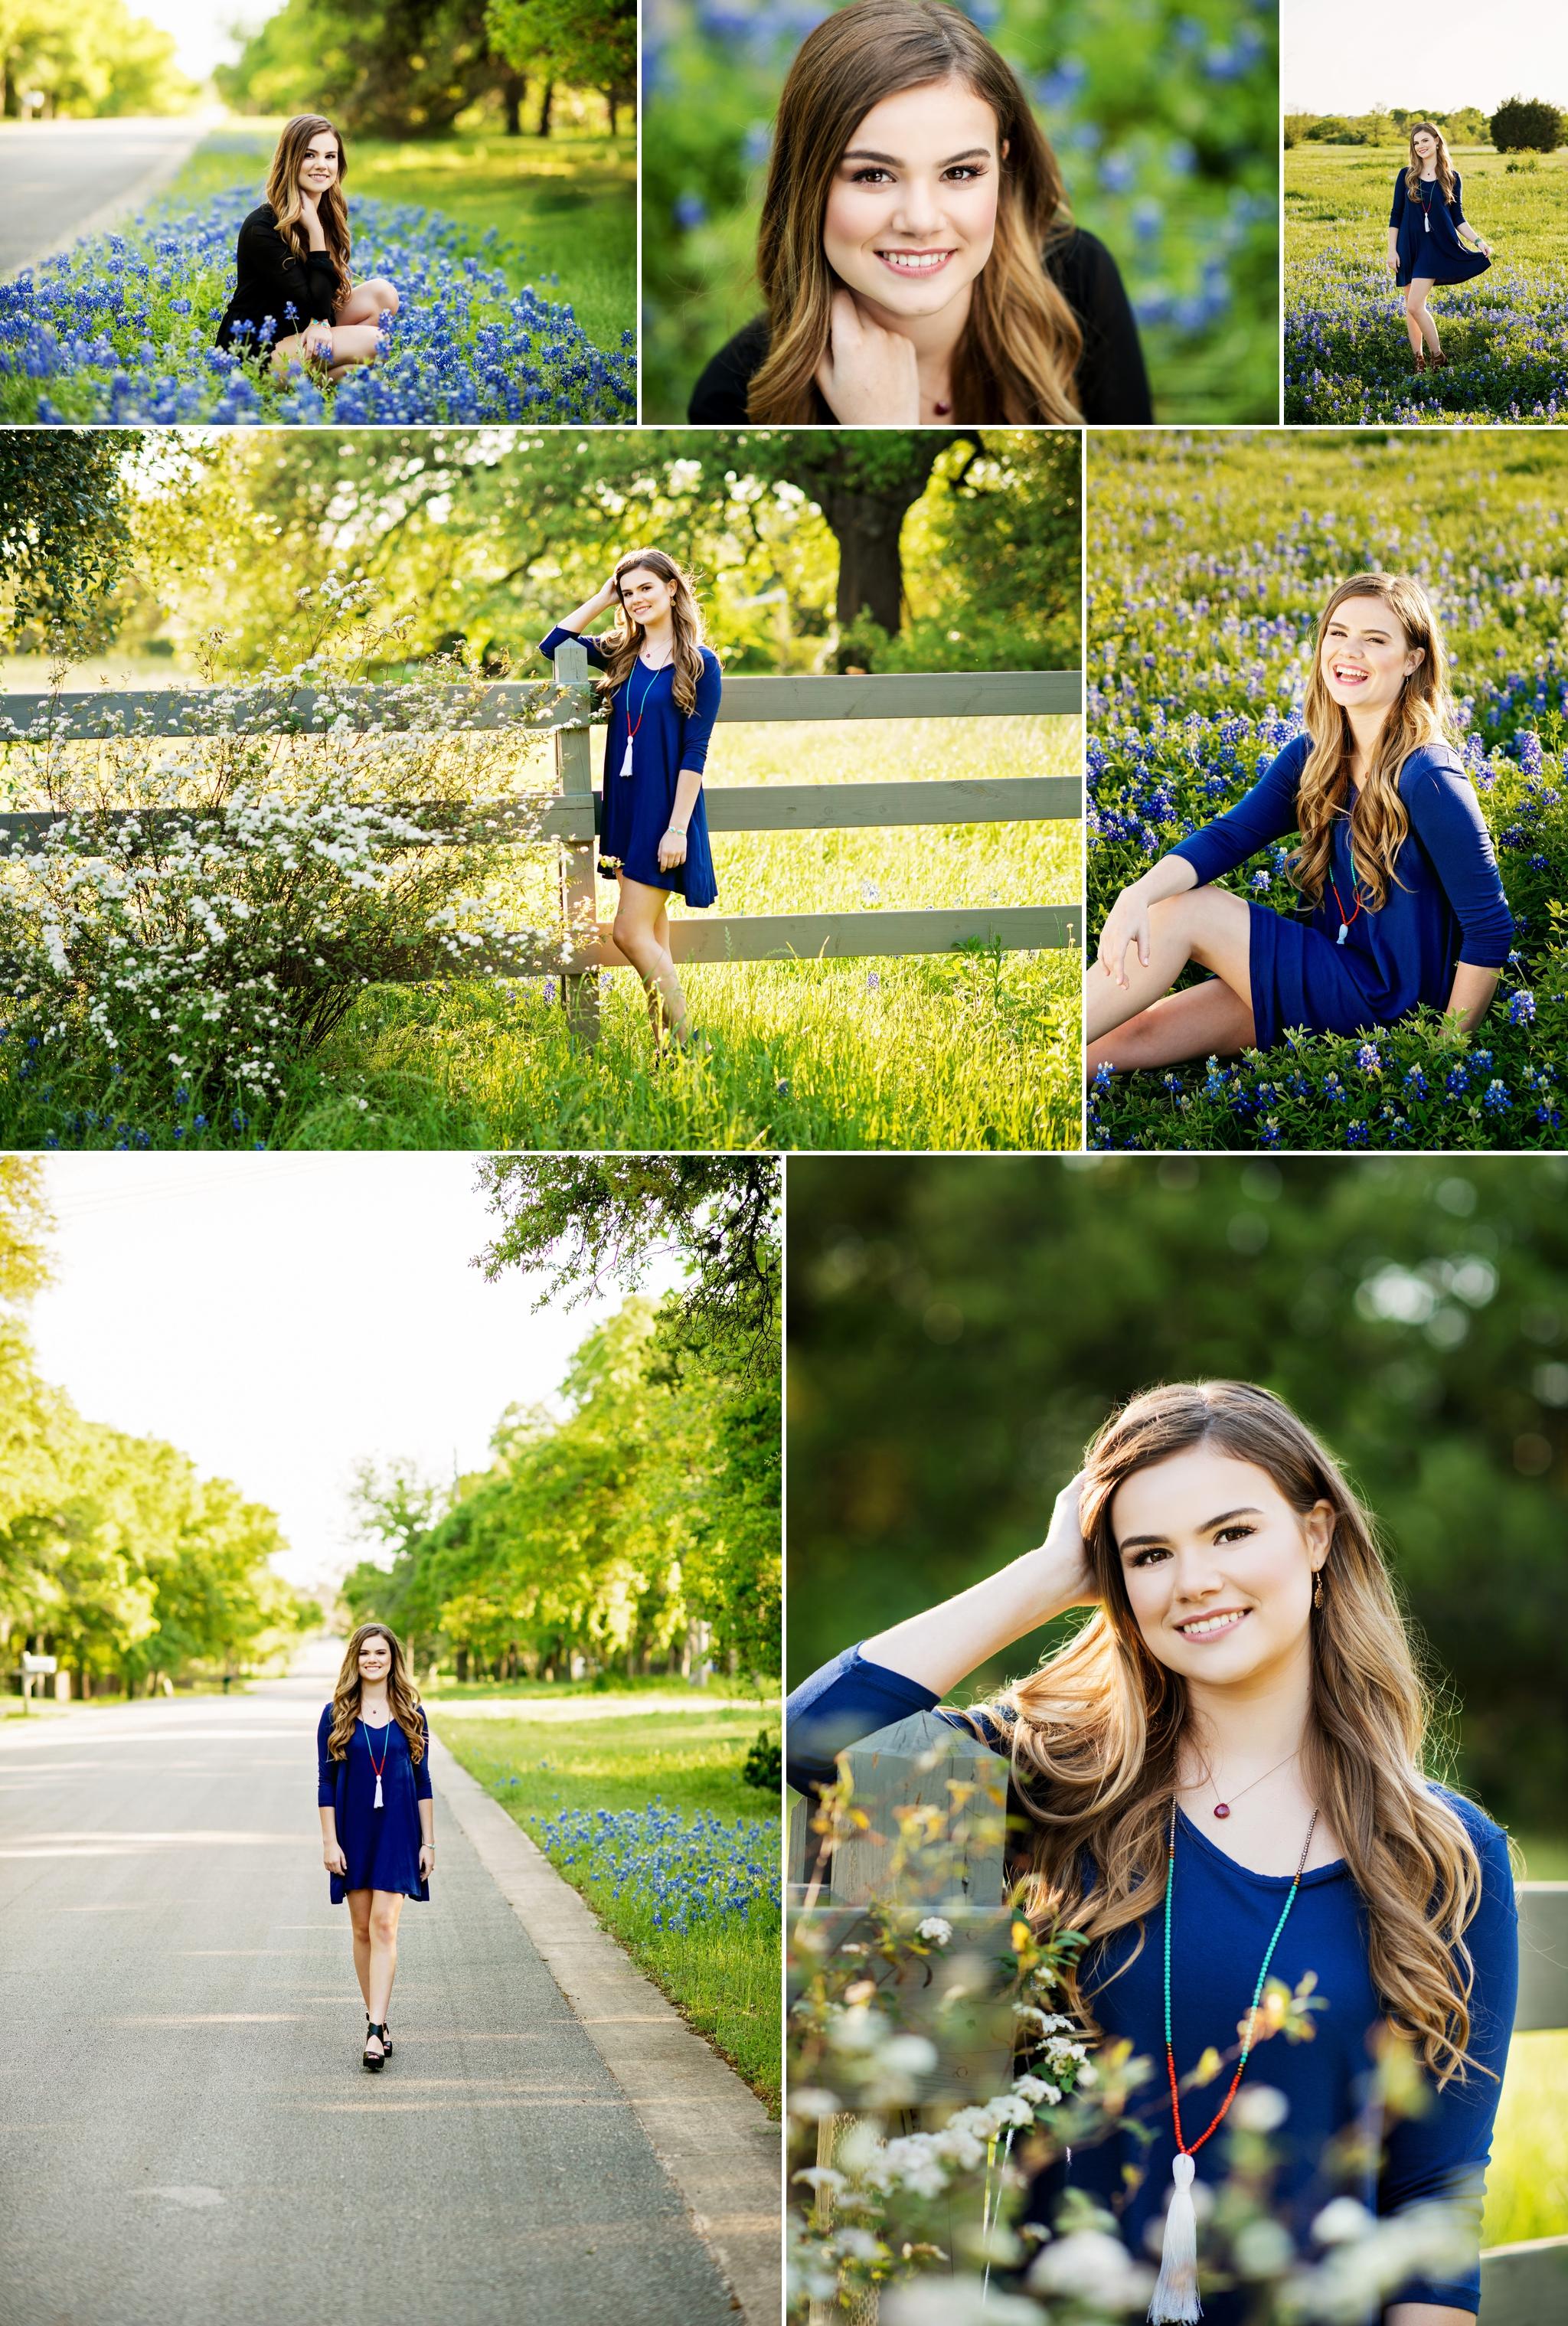 Austin Senior Portrait photography ideas